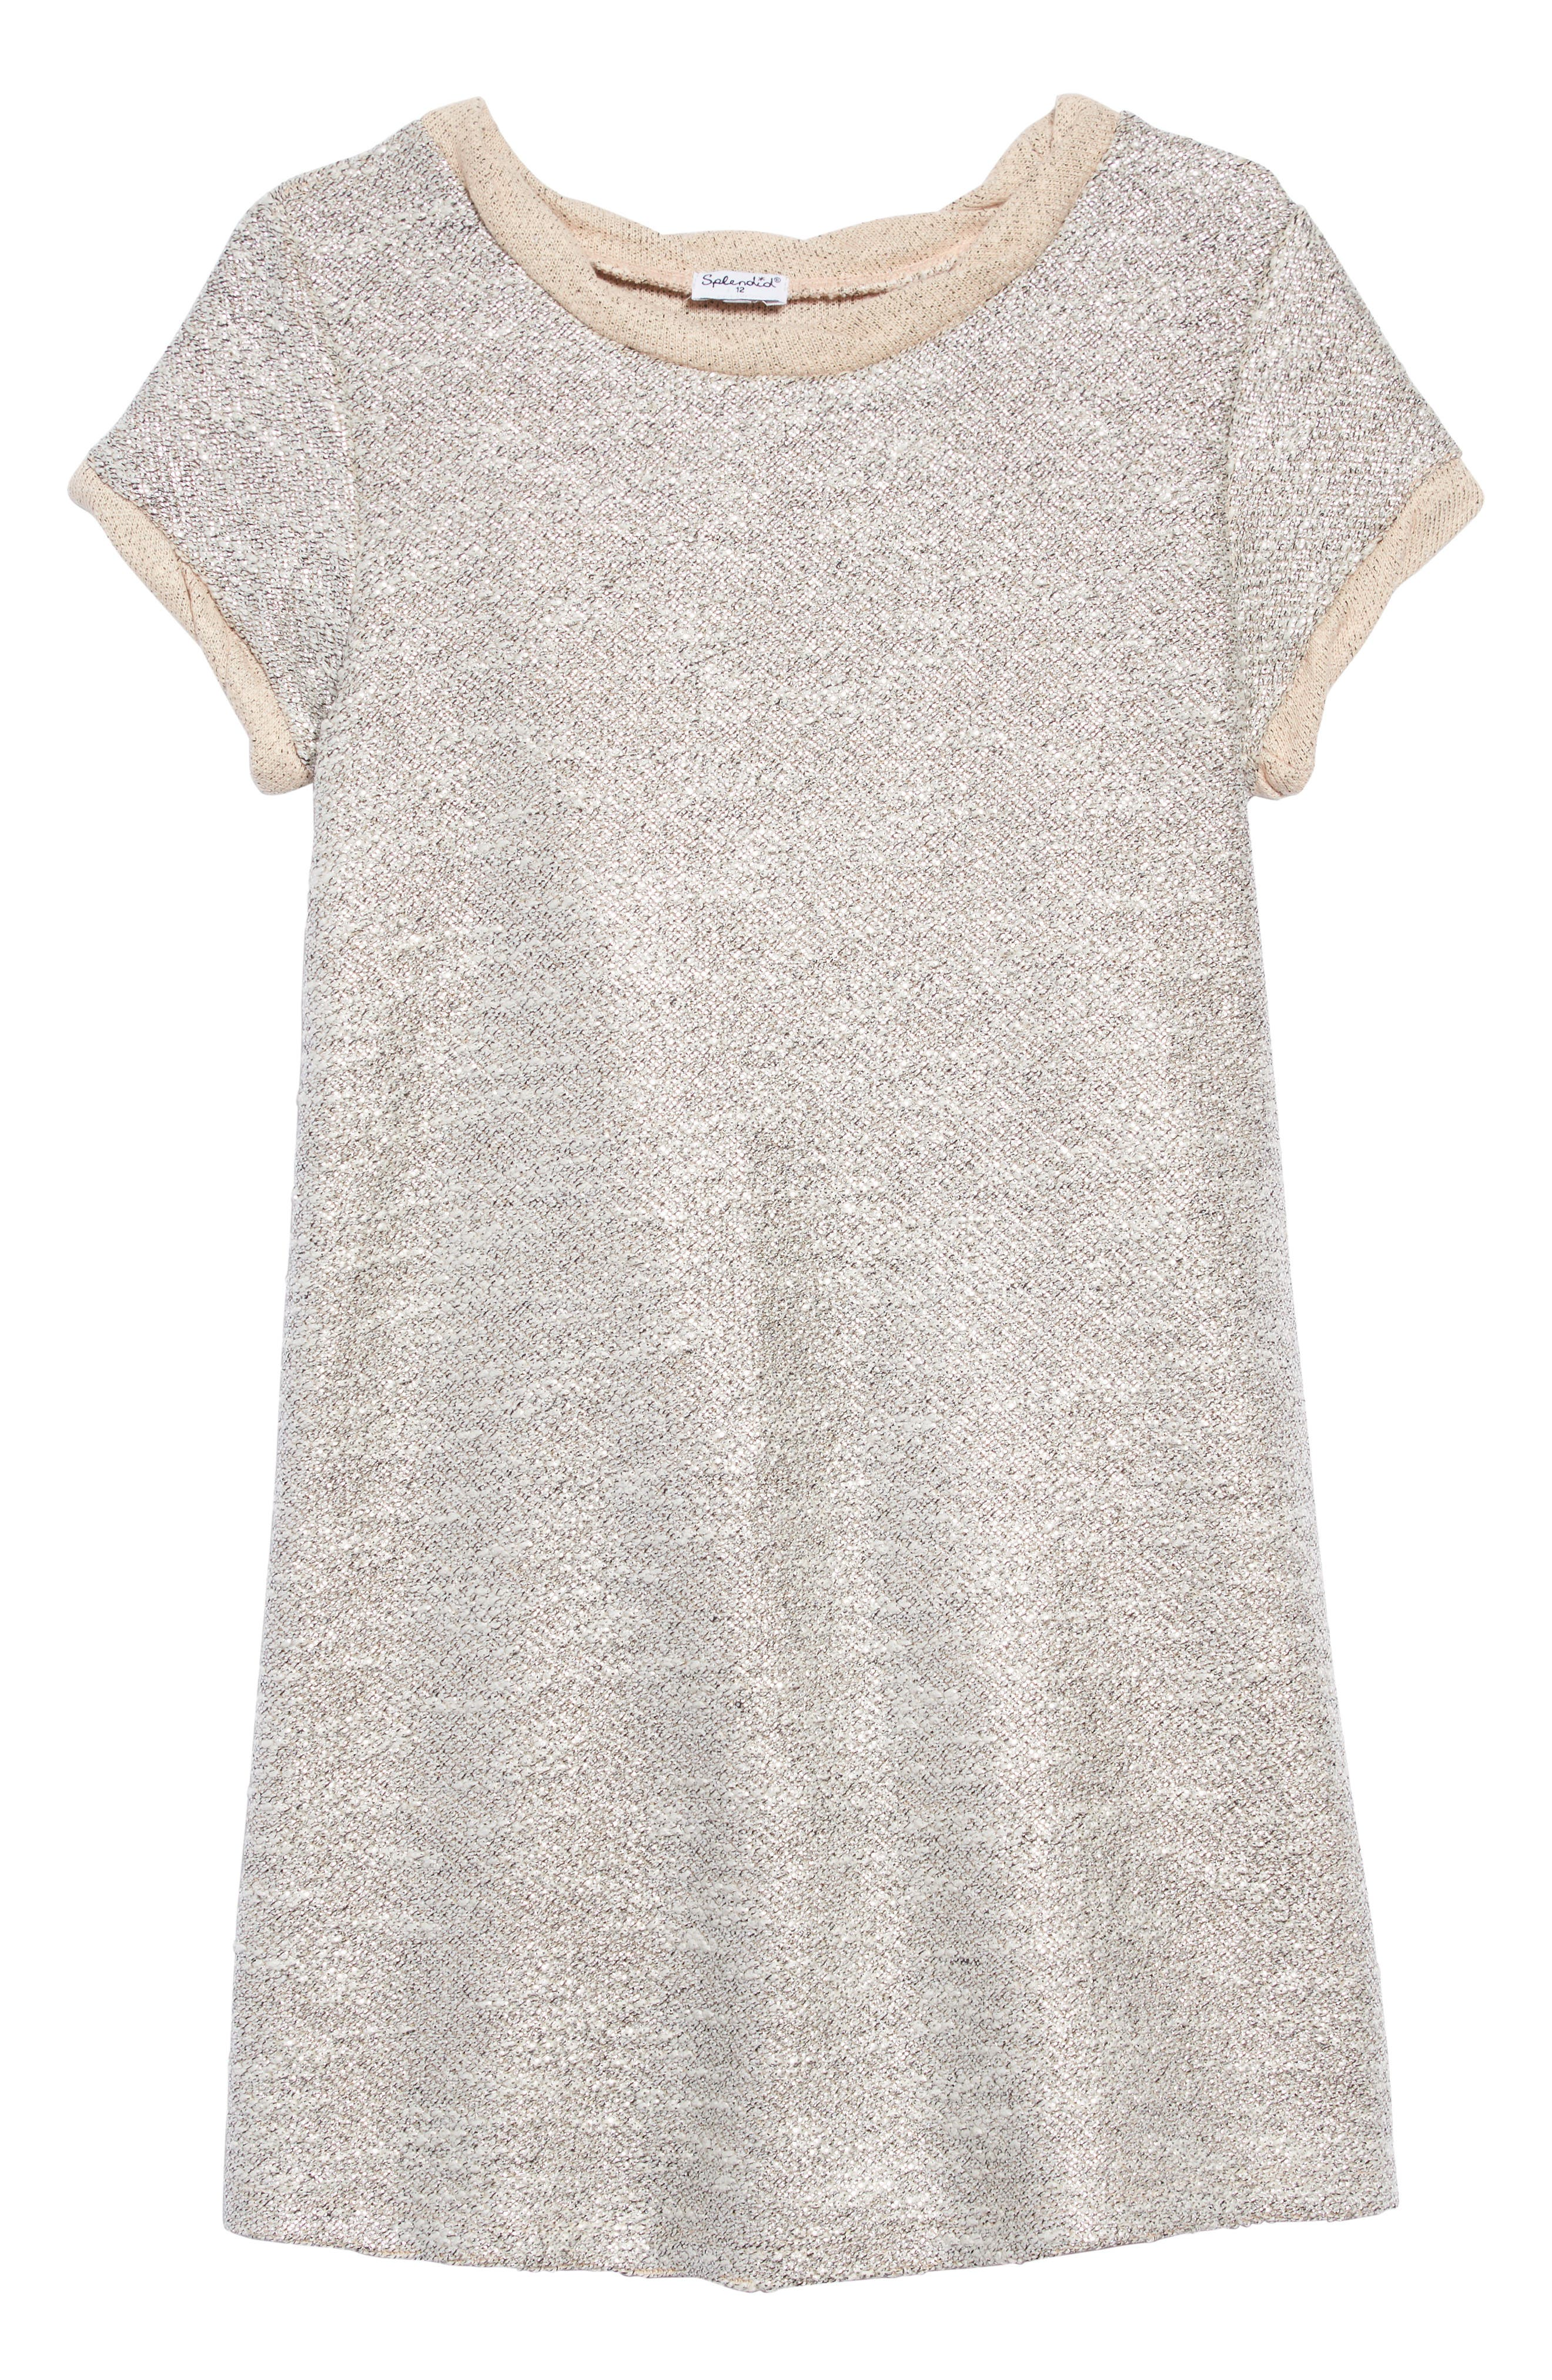 Metallic Shimmer Dress,                             Main thumbnail 1, color,                             PALE DOGWOOD